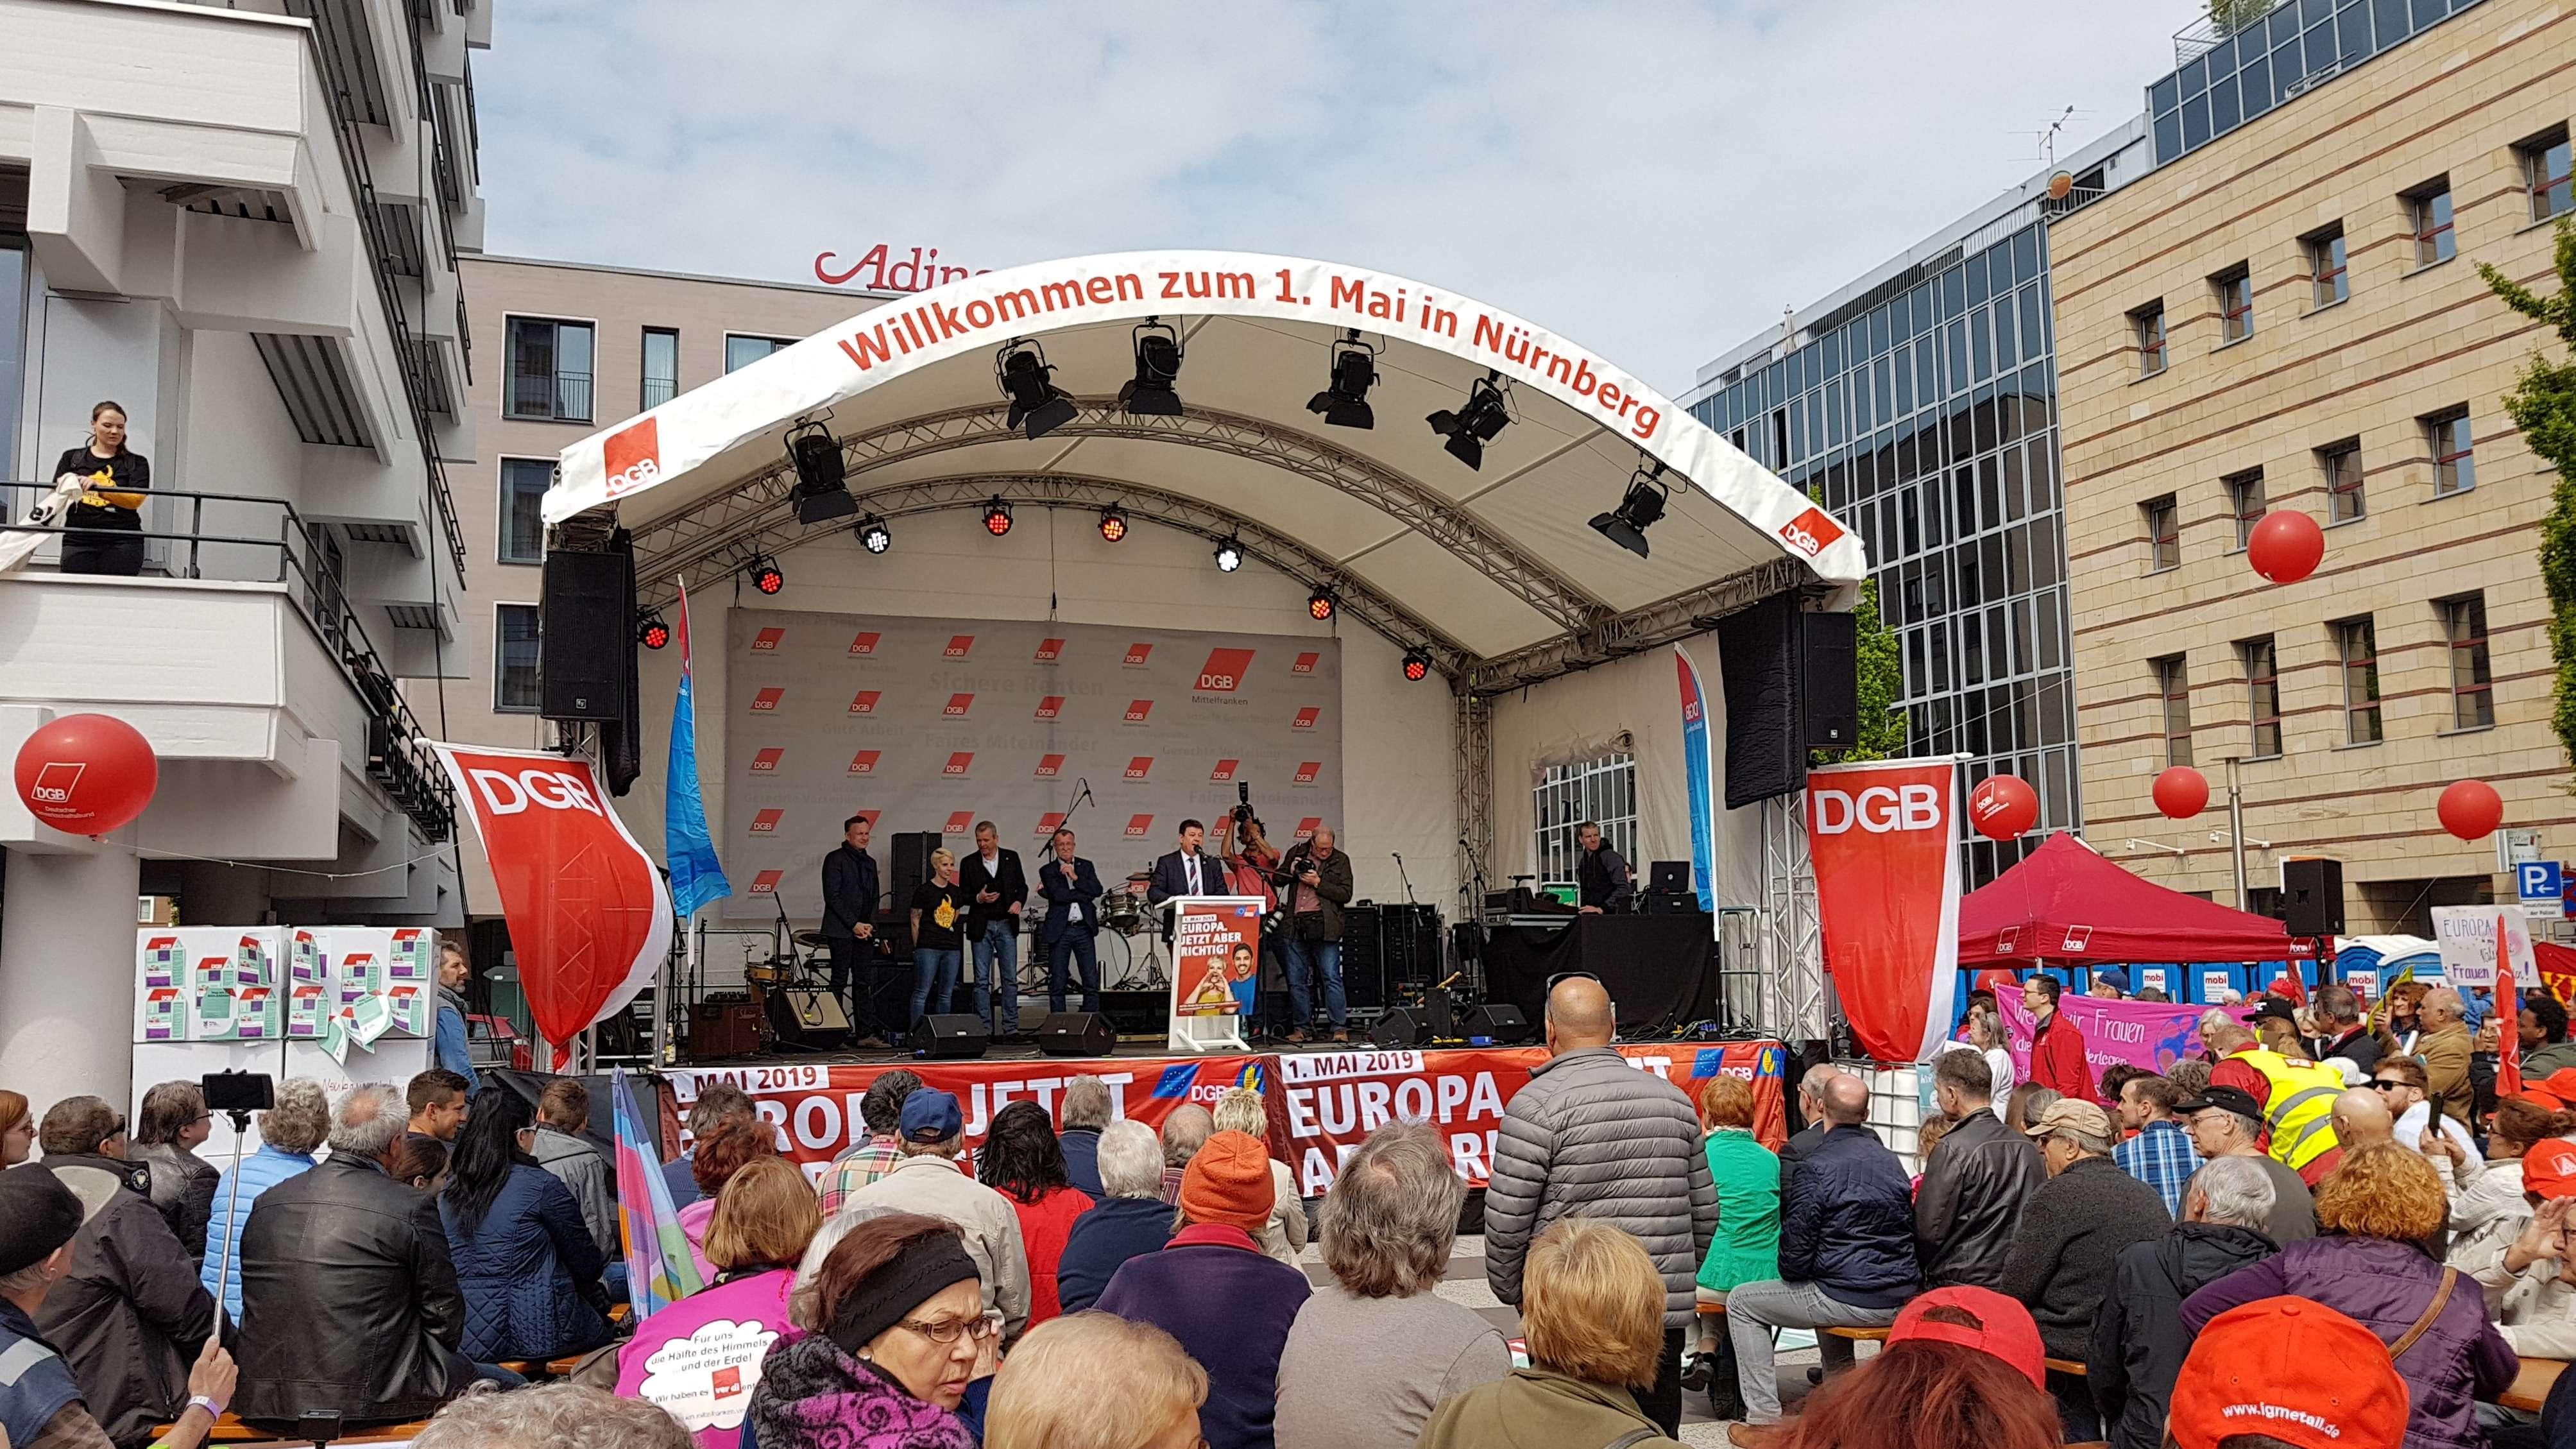 DGB-Kundgebung zum 1. Mai in Nürnberg